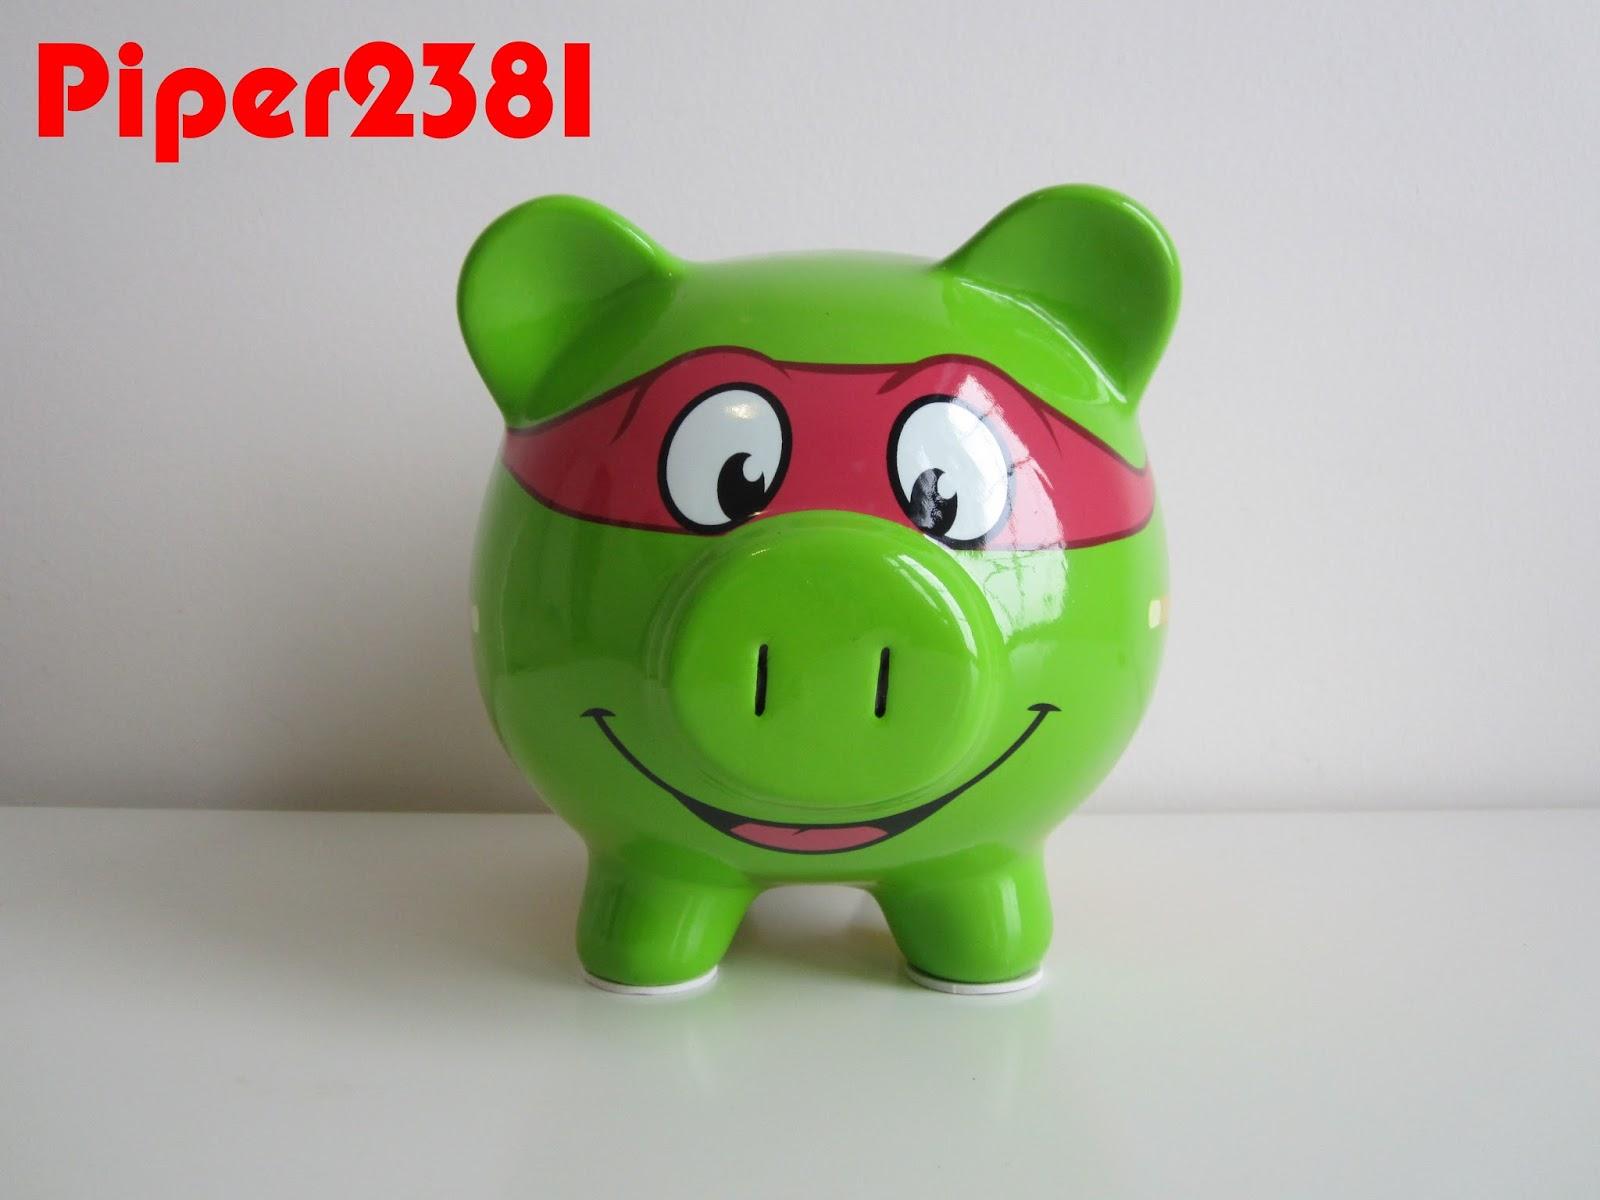 Piper2381 Teenage Mutant Ninja Turtles Piggy Bank